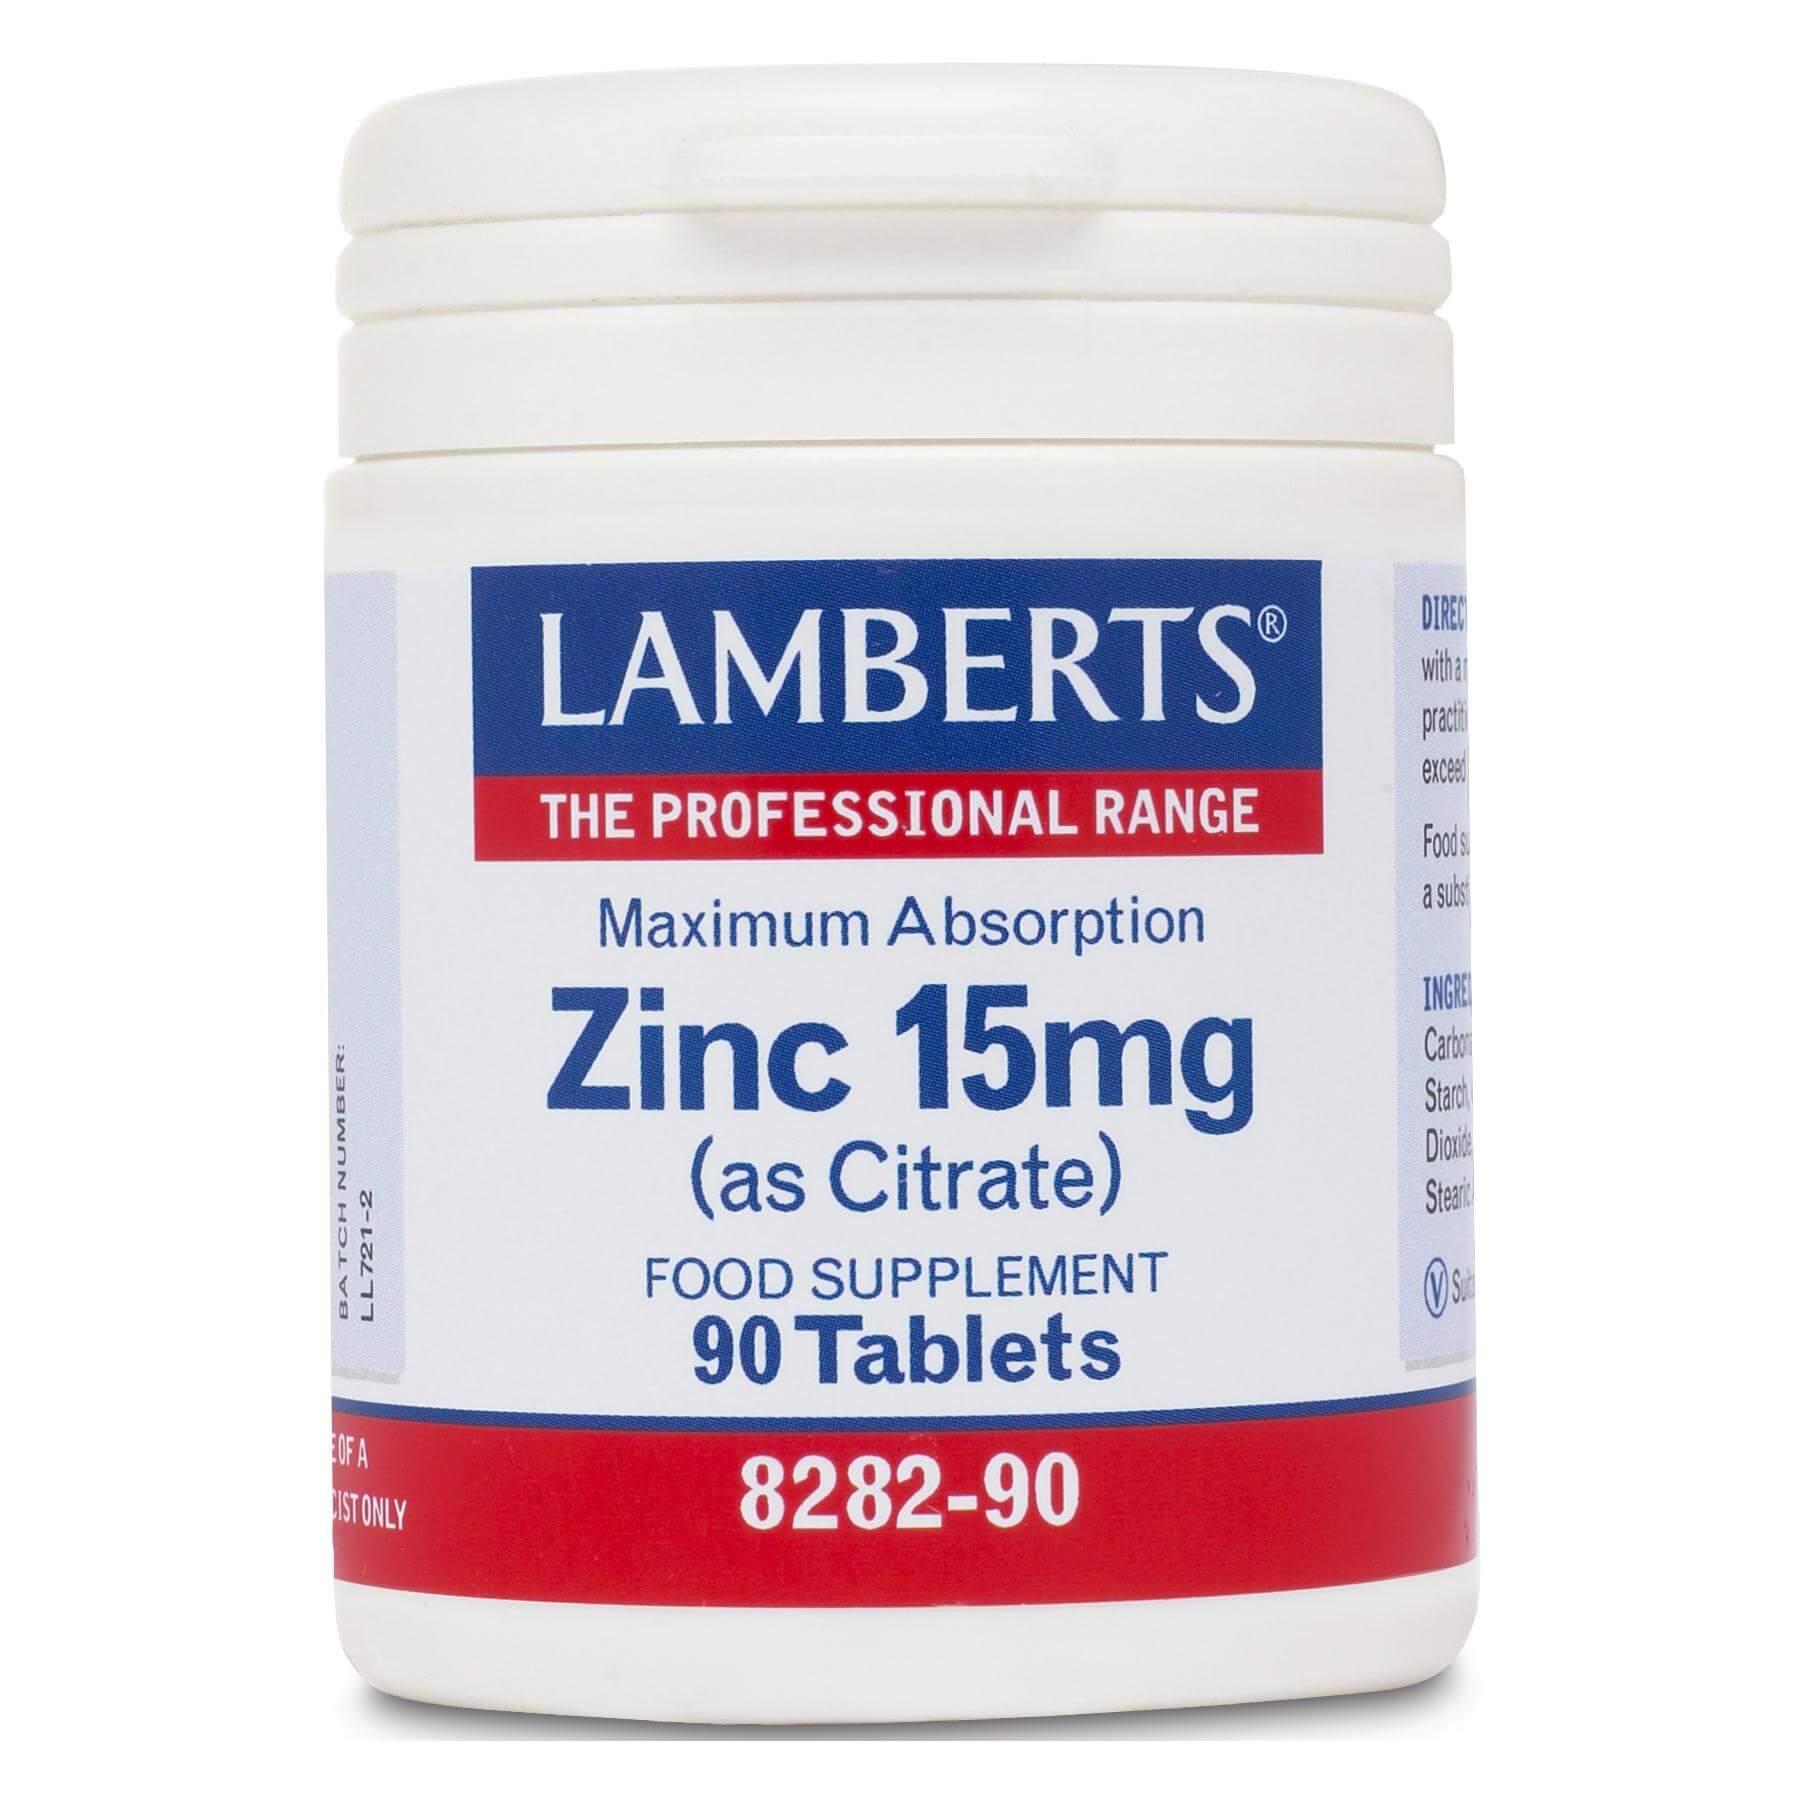 Lamberts Zinc Συμπλήρωμα Διατροφής με ΚιτρικόΨευδάργυρο15mg (as Citrate) 90tabs